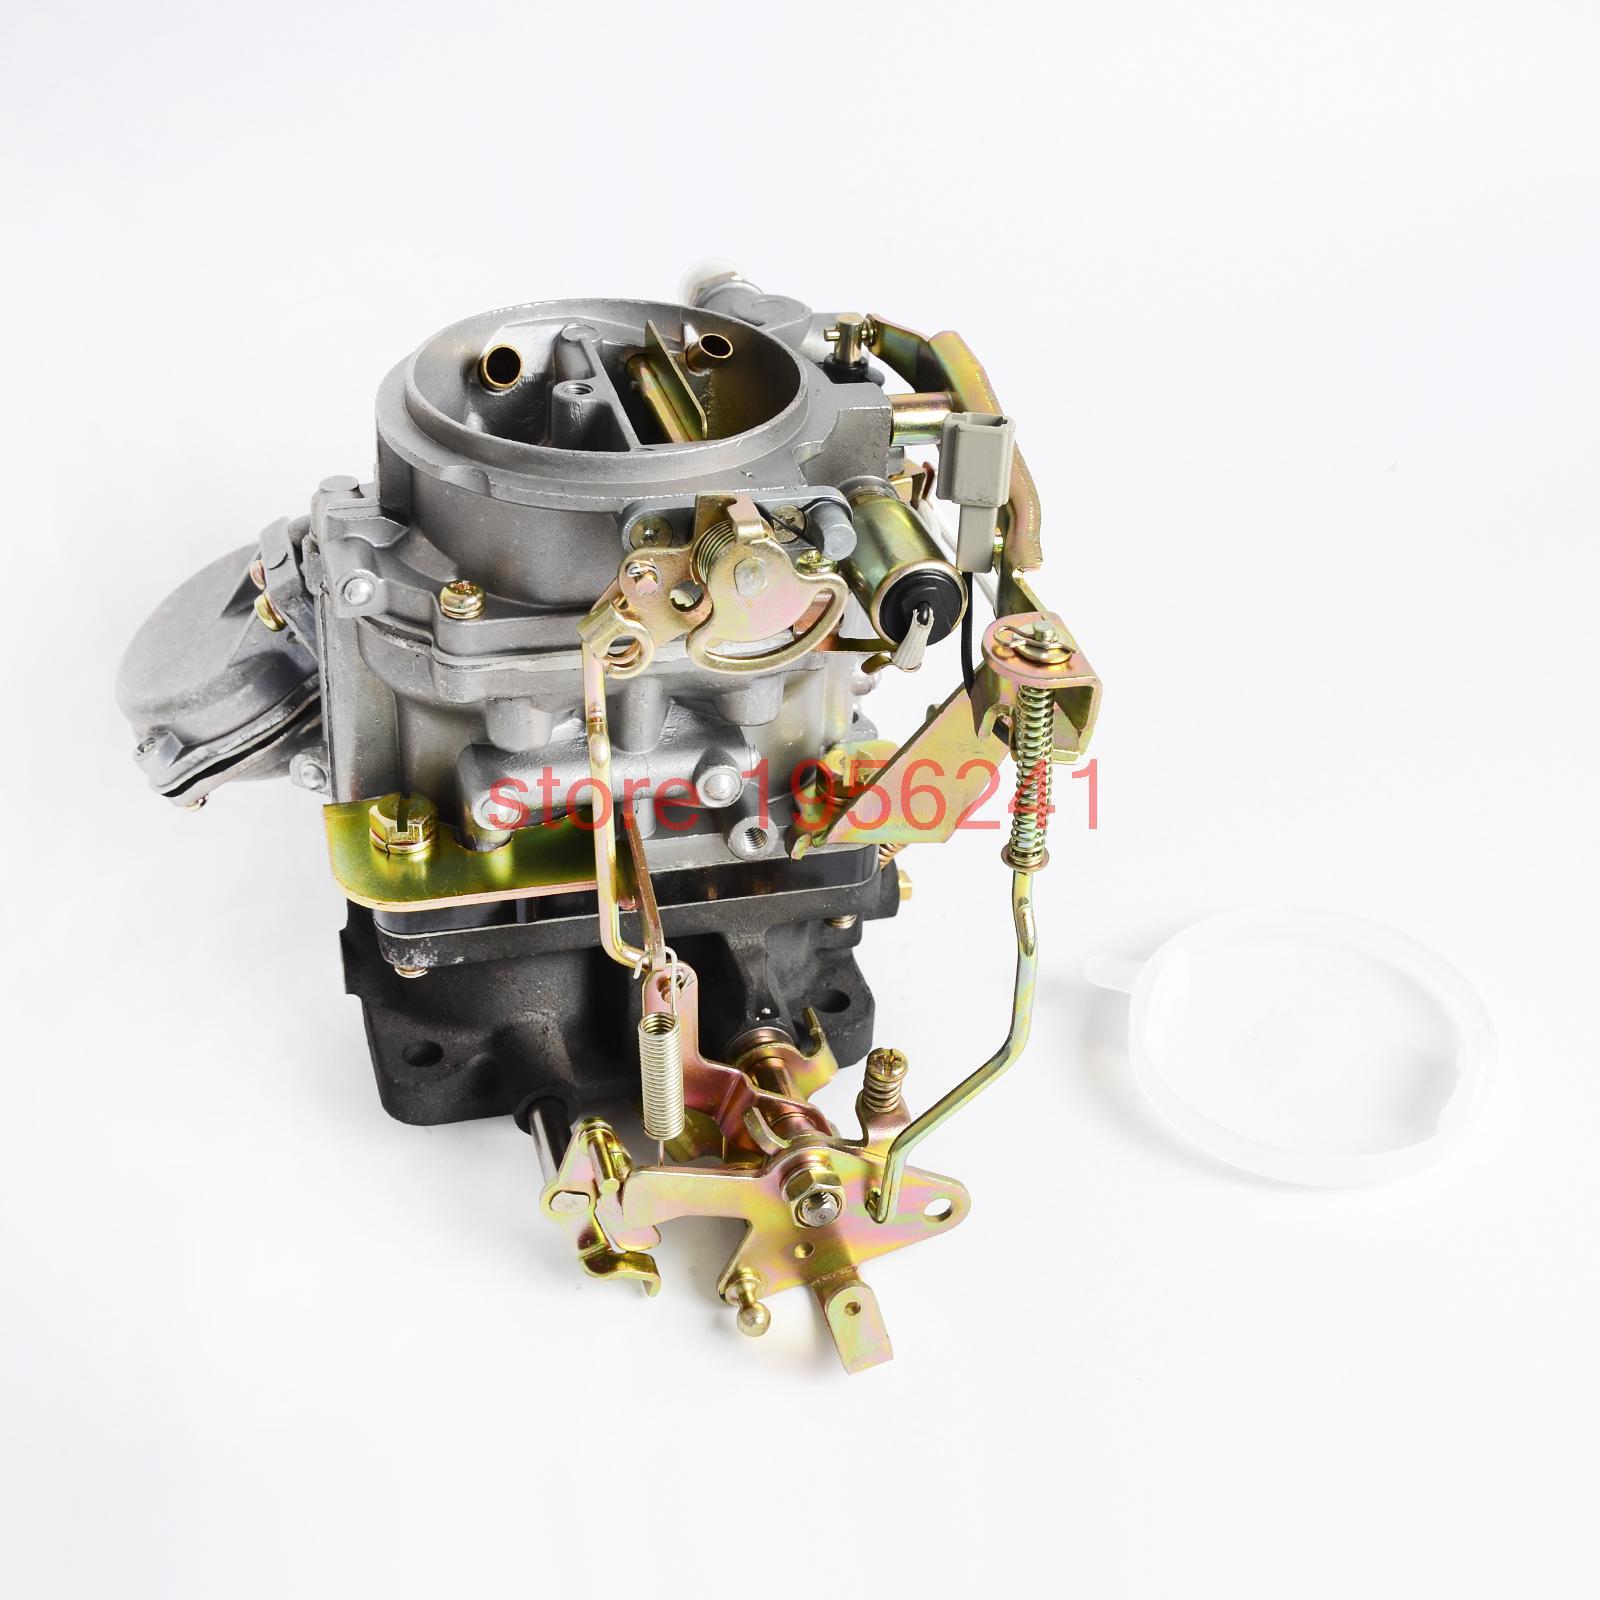 New Carburetor fit for TOYOTA 2F LAND CRUISER 1975 - 1987 1978 1980 1982 1984 1986 Carby Part Number 21100-61012 pardo patrick dean robert john baldessari catalogue raisonne volume 2 1975 1986